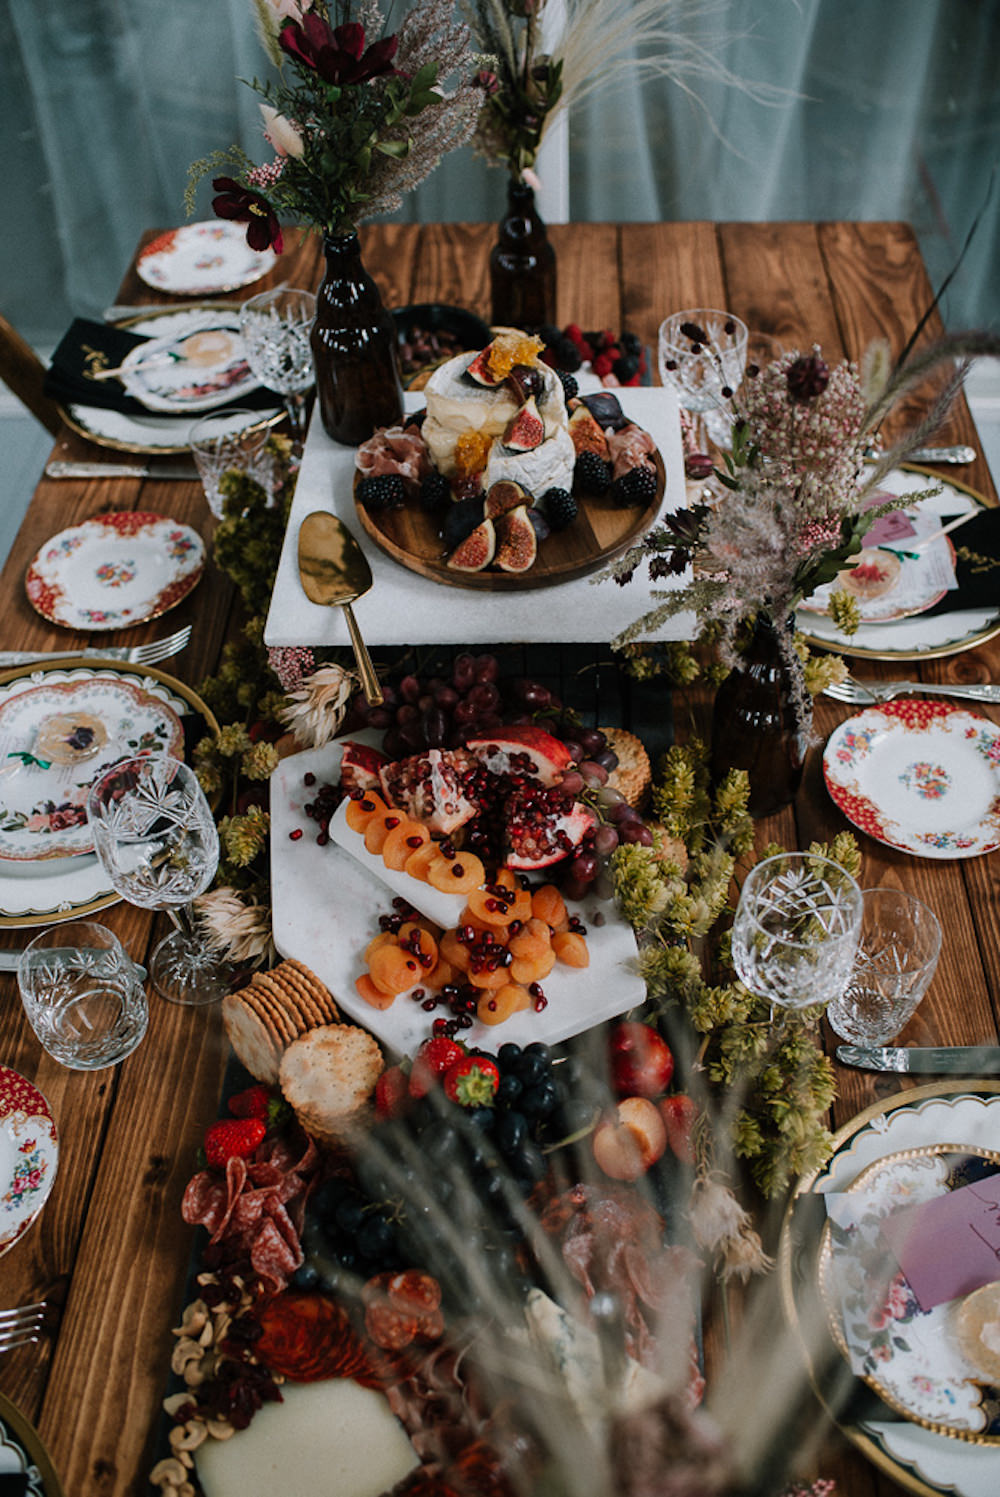 Grazing Table Sharing Platter Unconventional Wedding Ideas Pierra G Photography